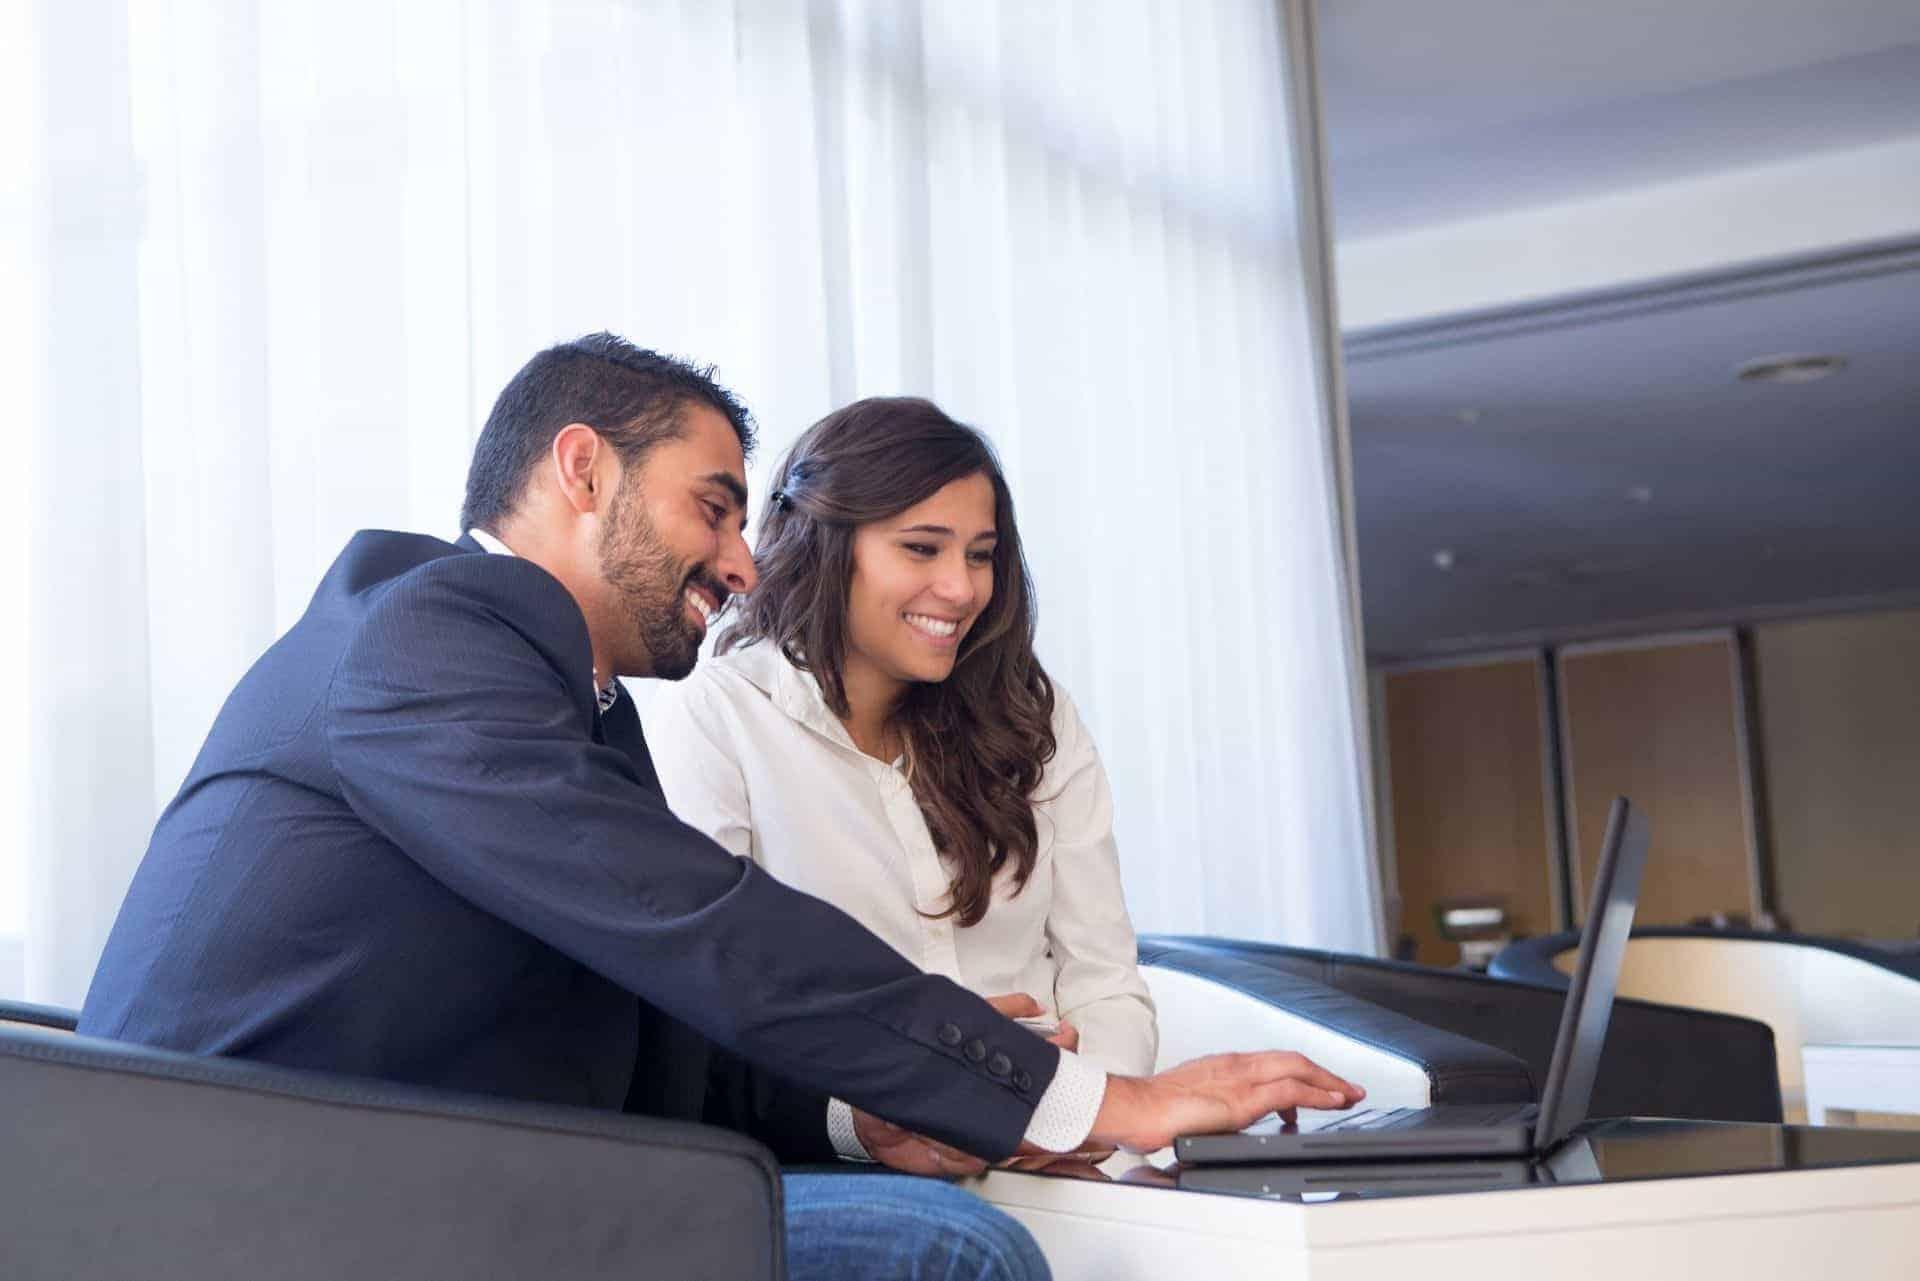 hire-home2decor interior designer team